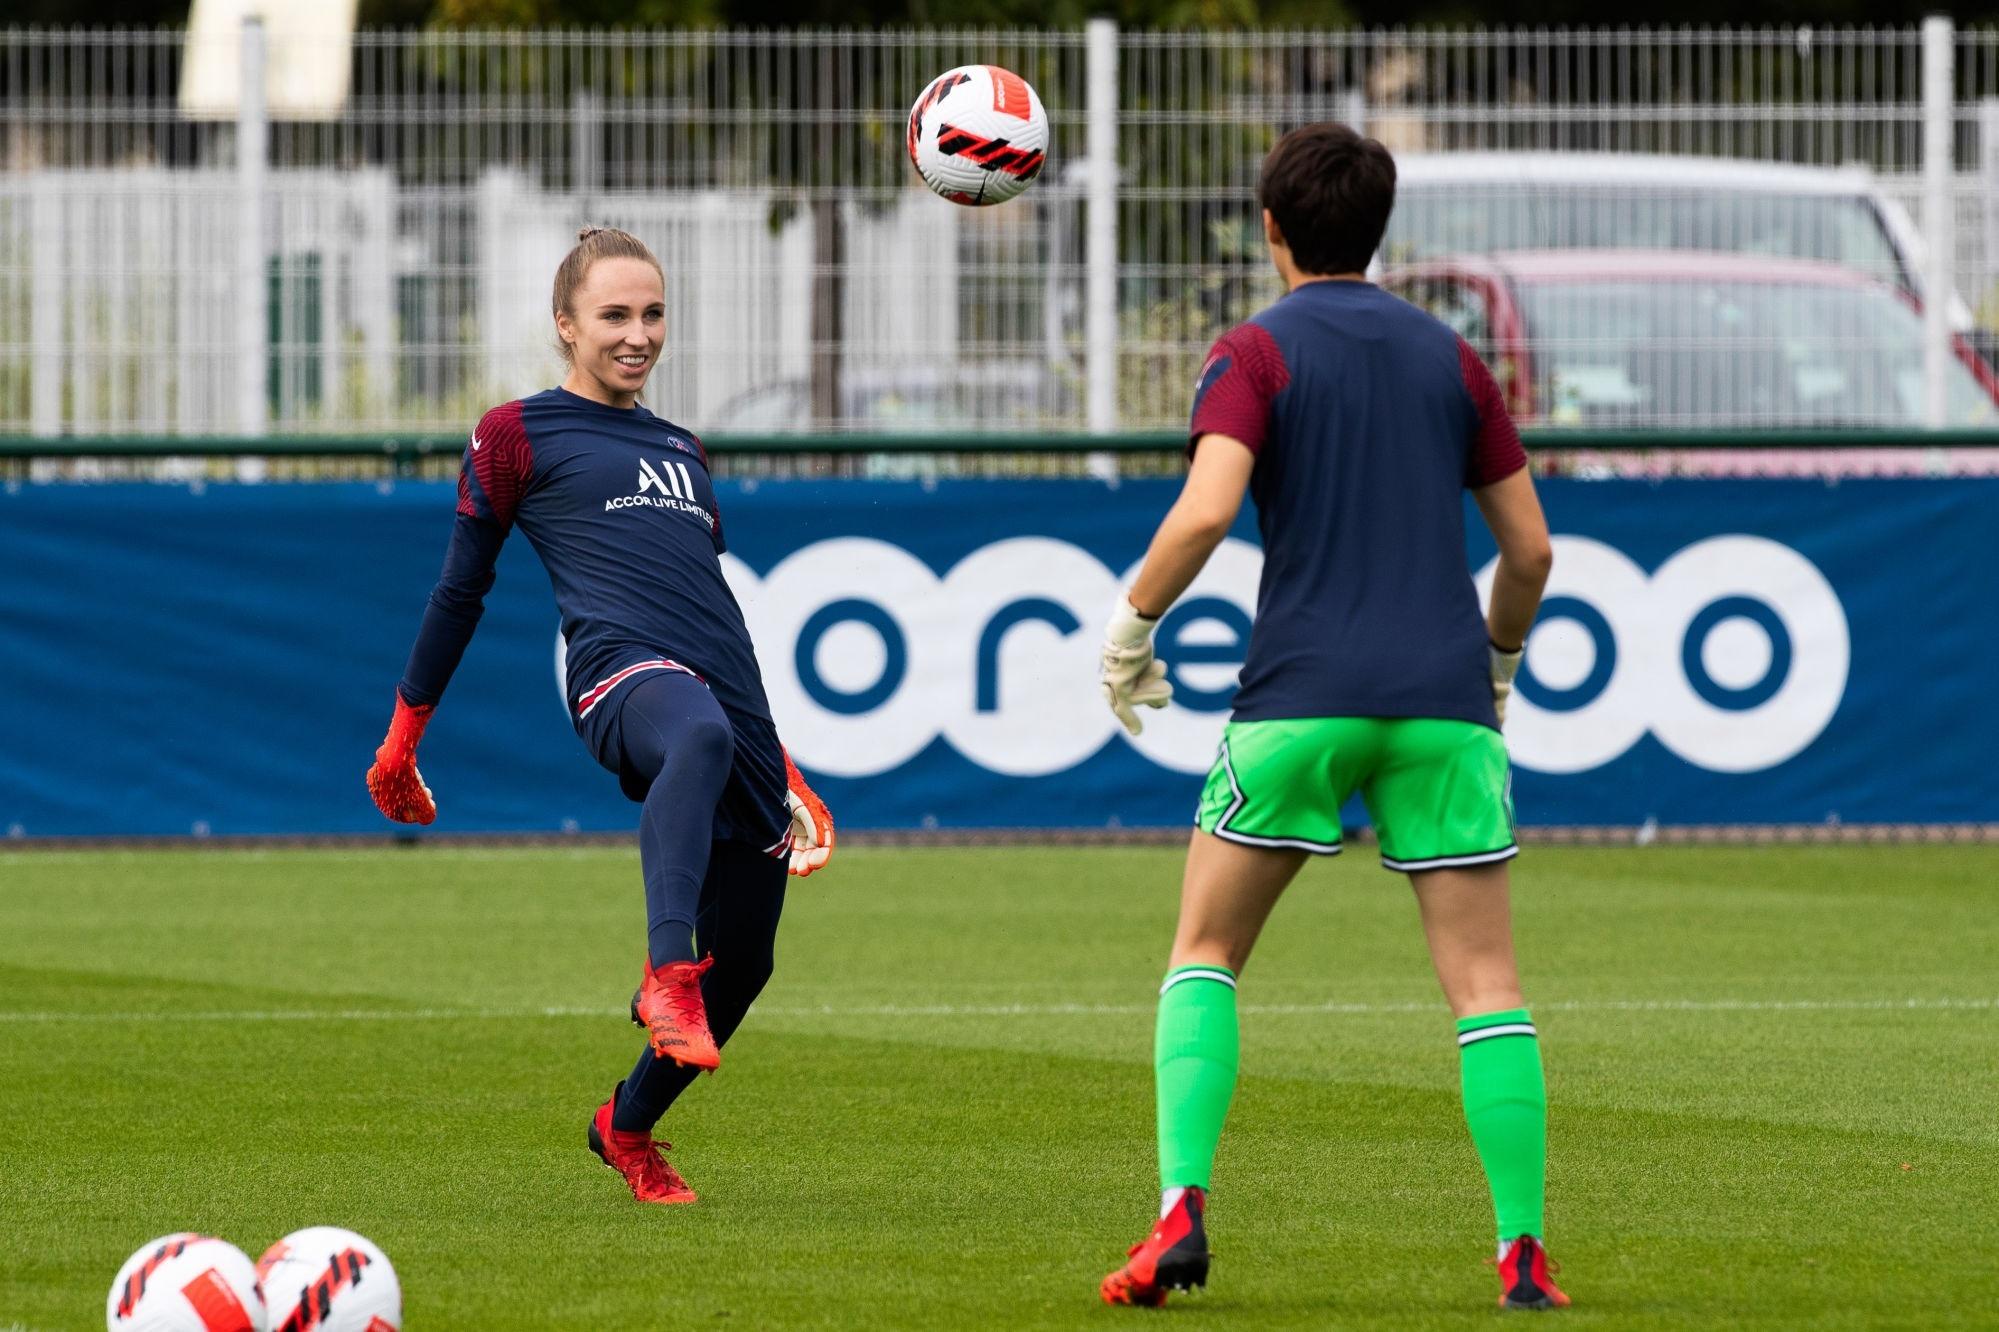 Breidablik/PSG - Votikova savoure son premier match et la victoire